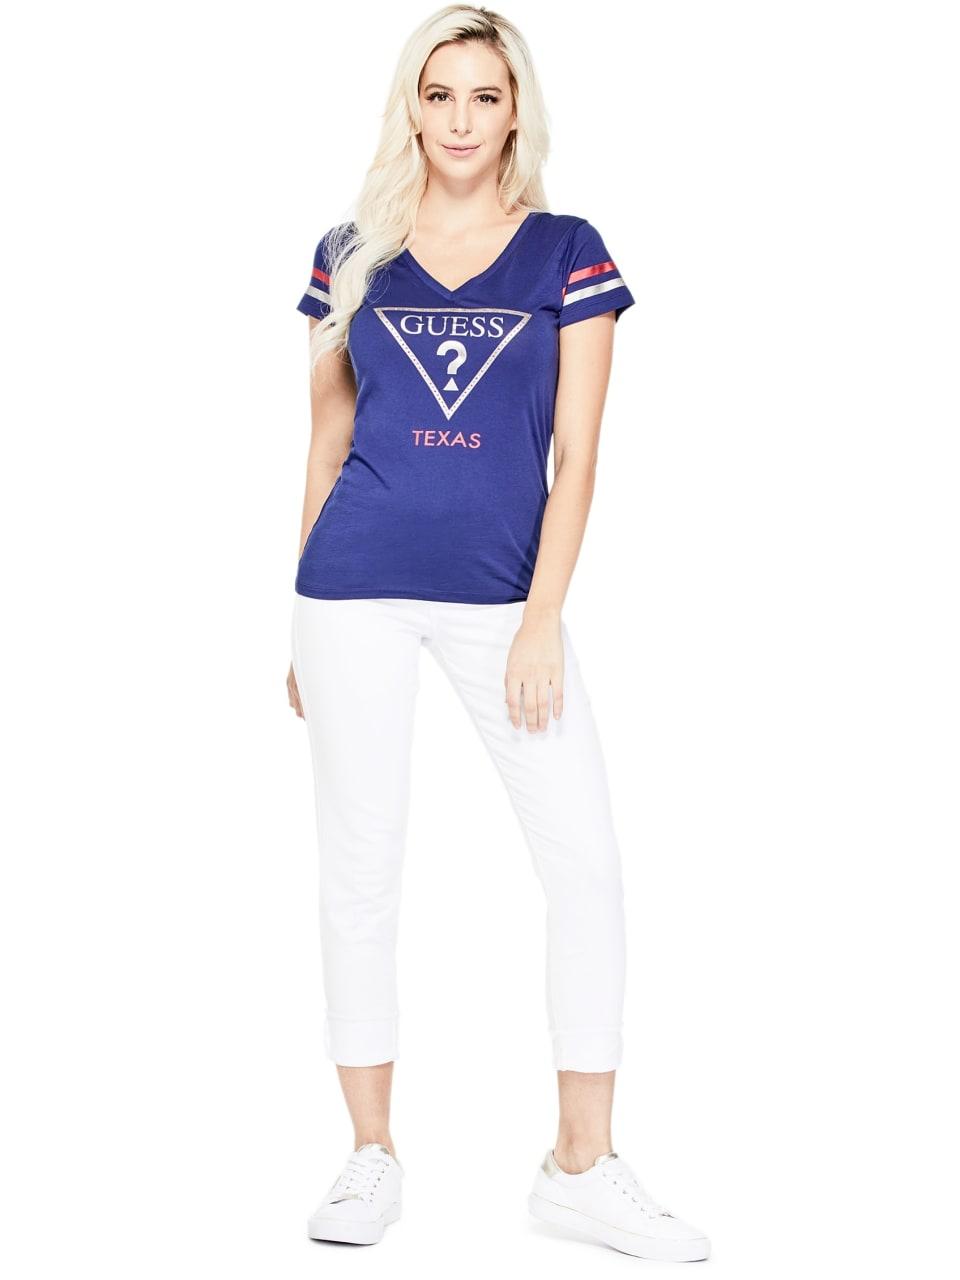 GUESS-Factory-Women-039-s-Texas-City-V-Neck-Varsity-Short-Sleeve-Tee thumbnail 11